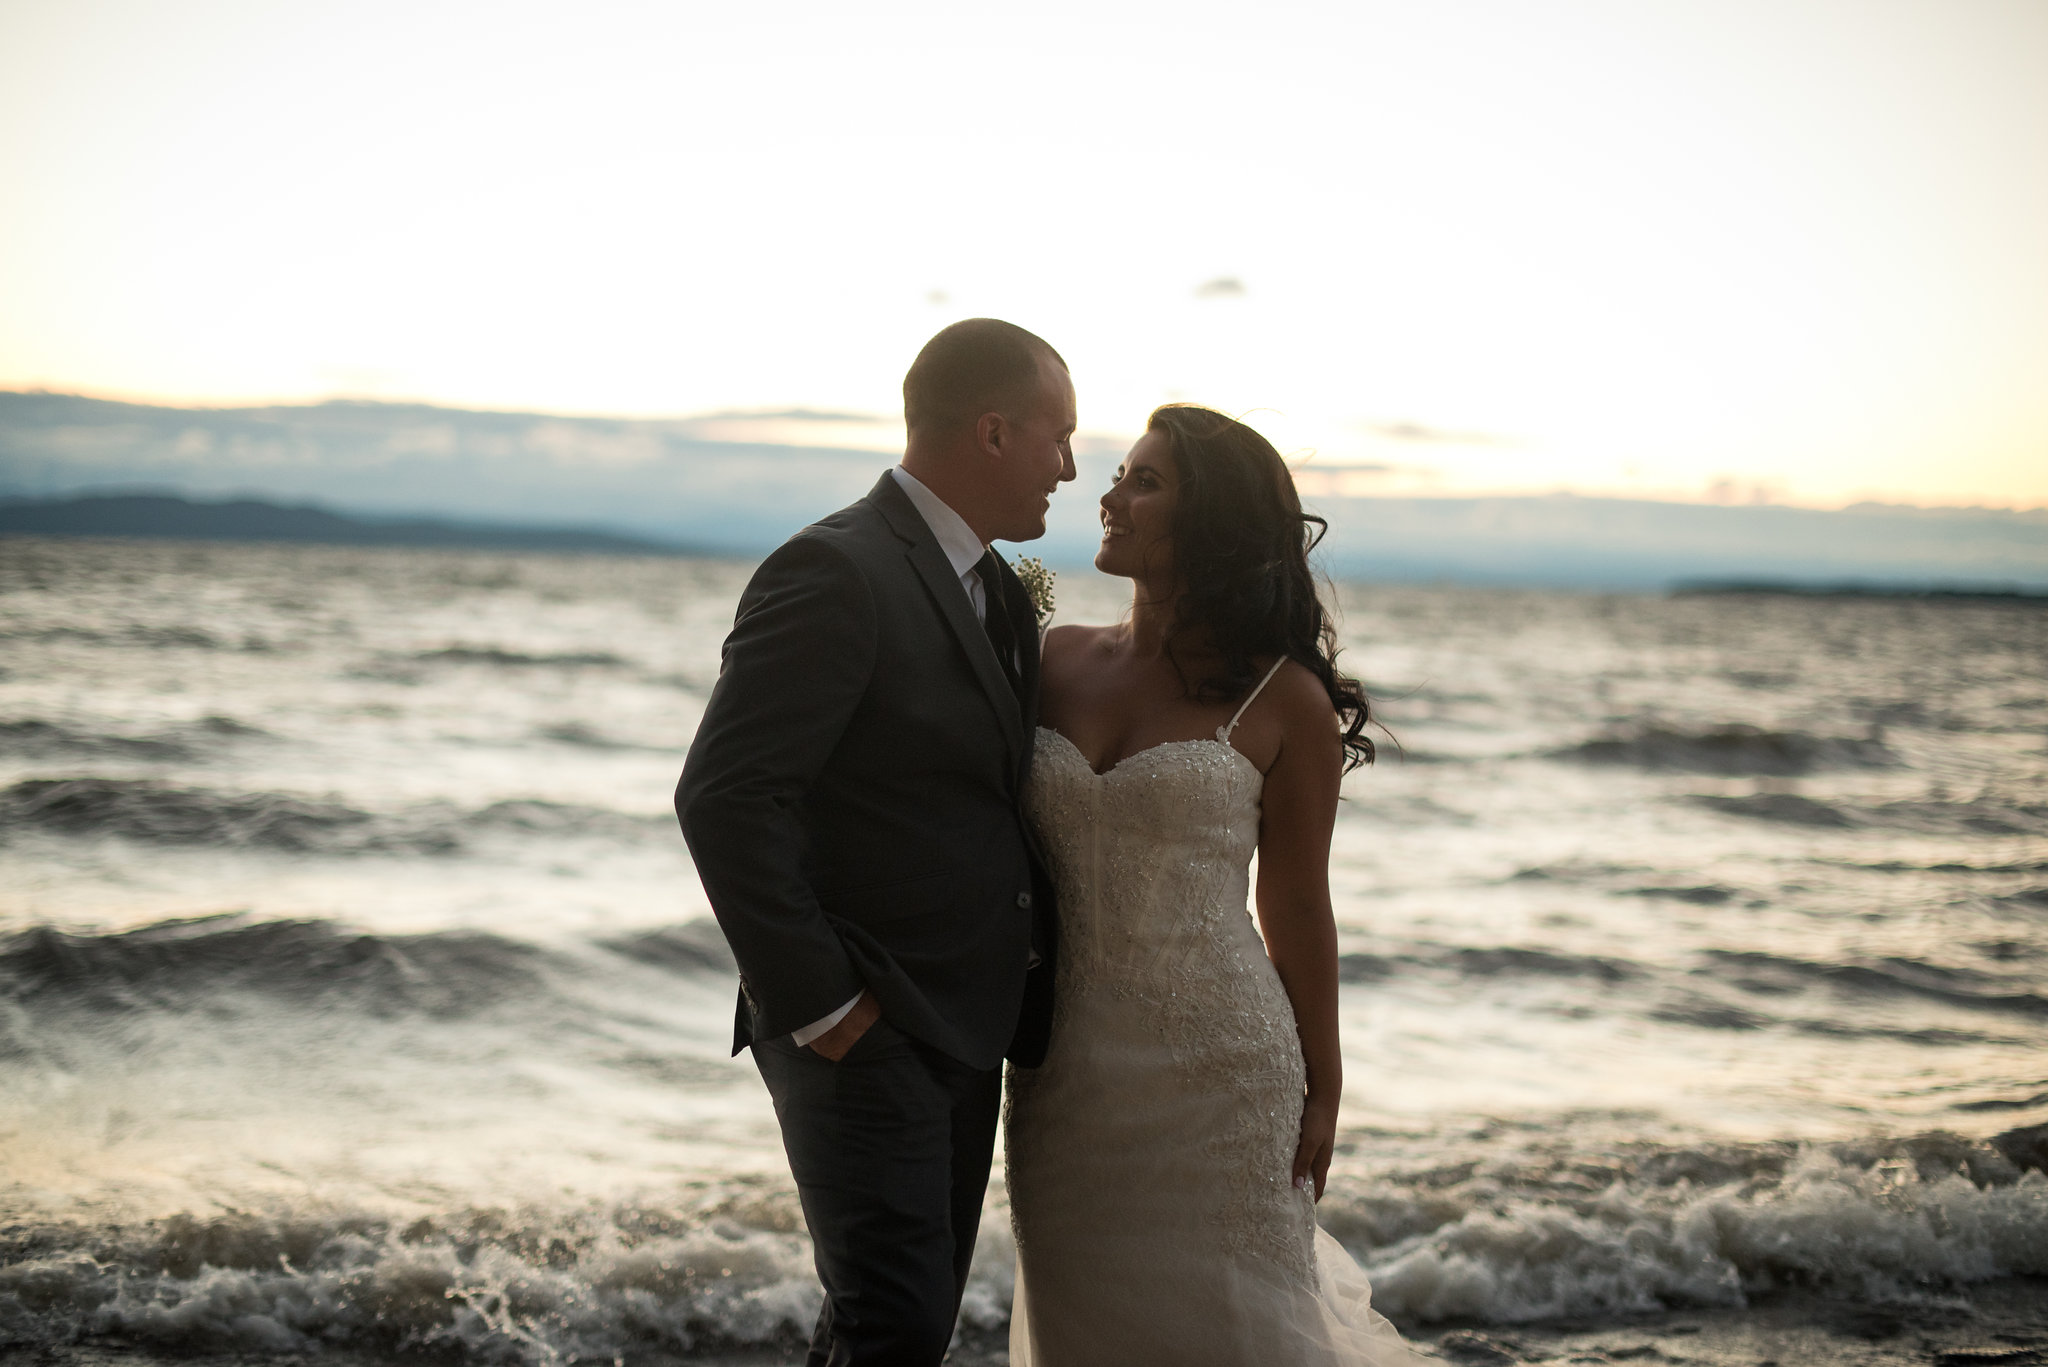 st-augustine-wedding-photographer-sarah-annay-photography.jpg23.jpg